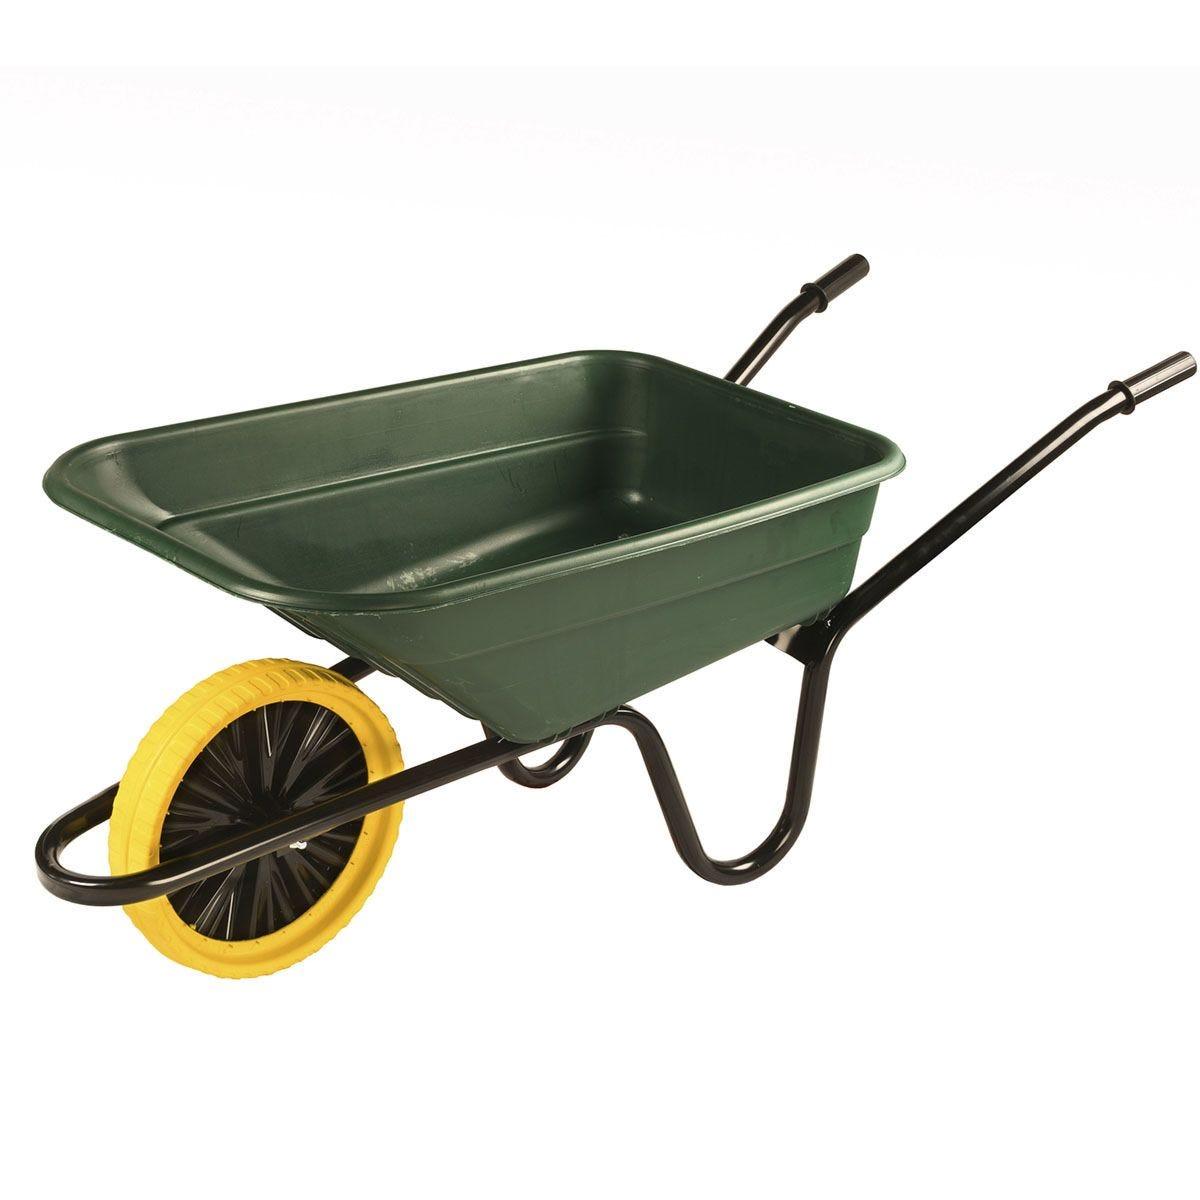 Walsall Wheelbarrow 90L Polypropylene Barrow In A Box with Punture Proof Wheel - Green